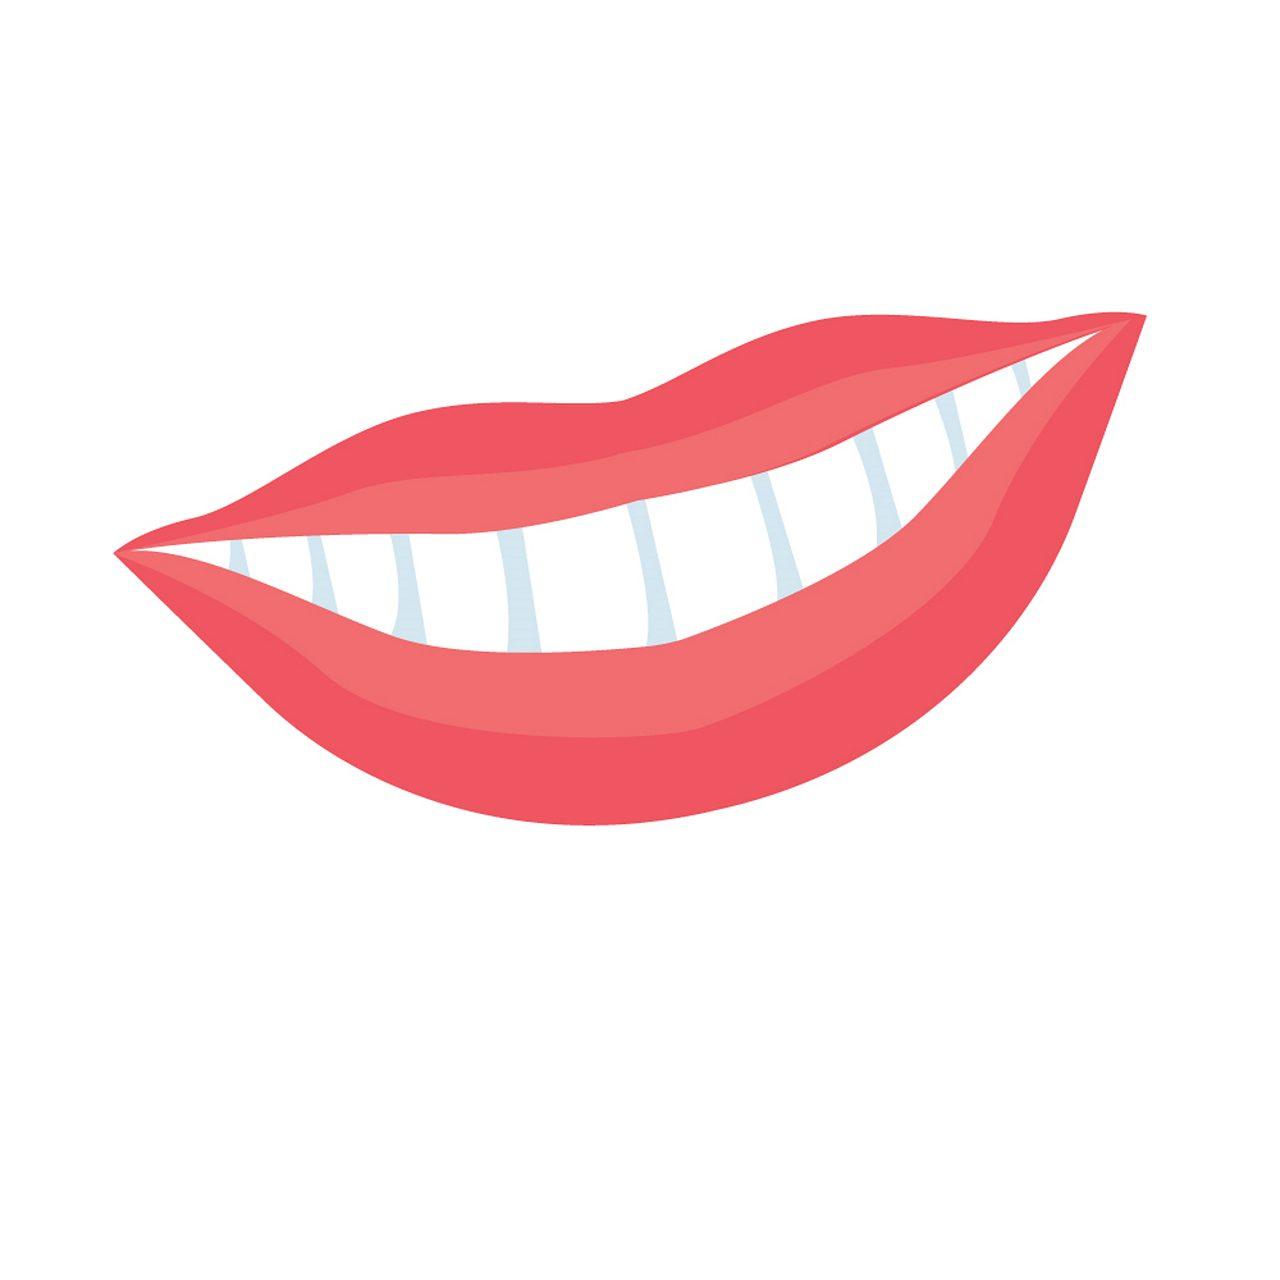 Zijlstra Tanden Theater spoedhulp tandarts